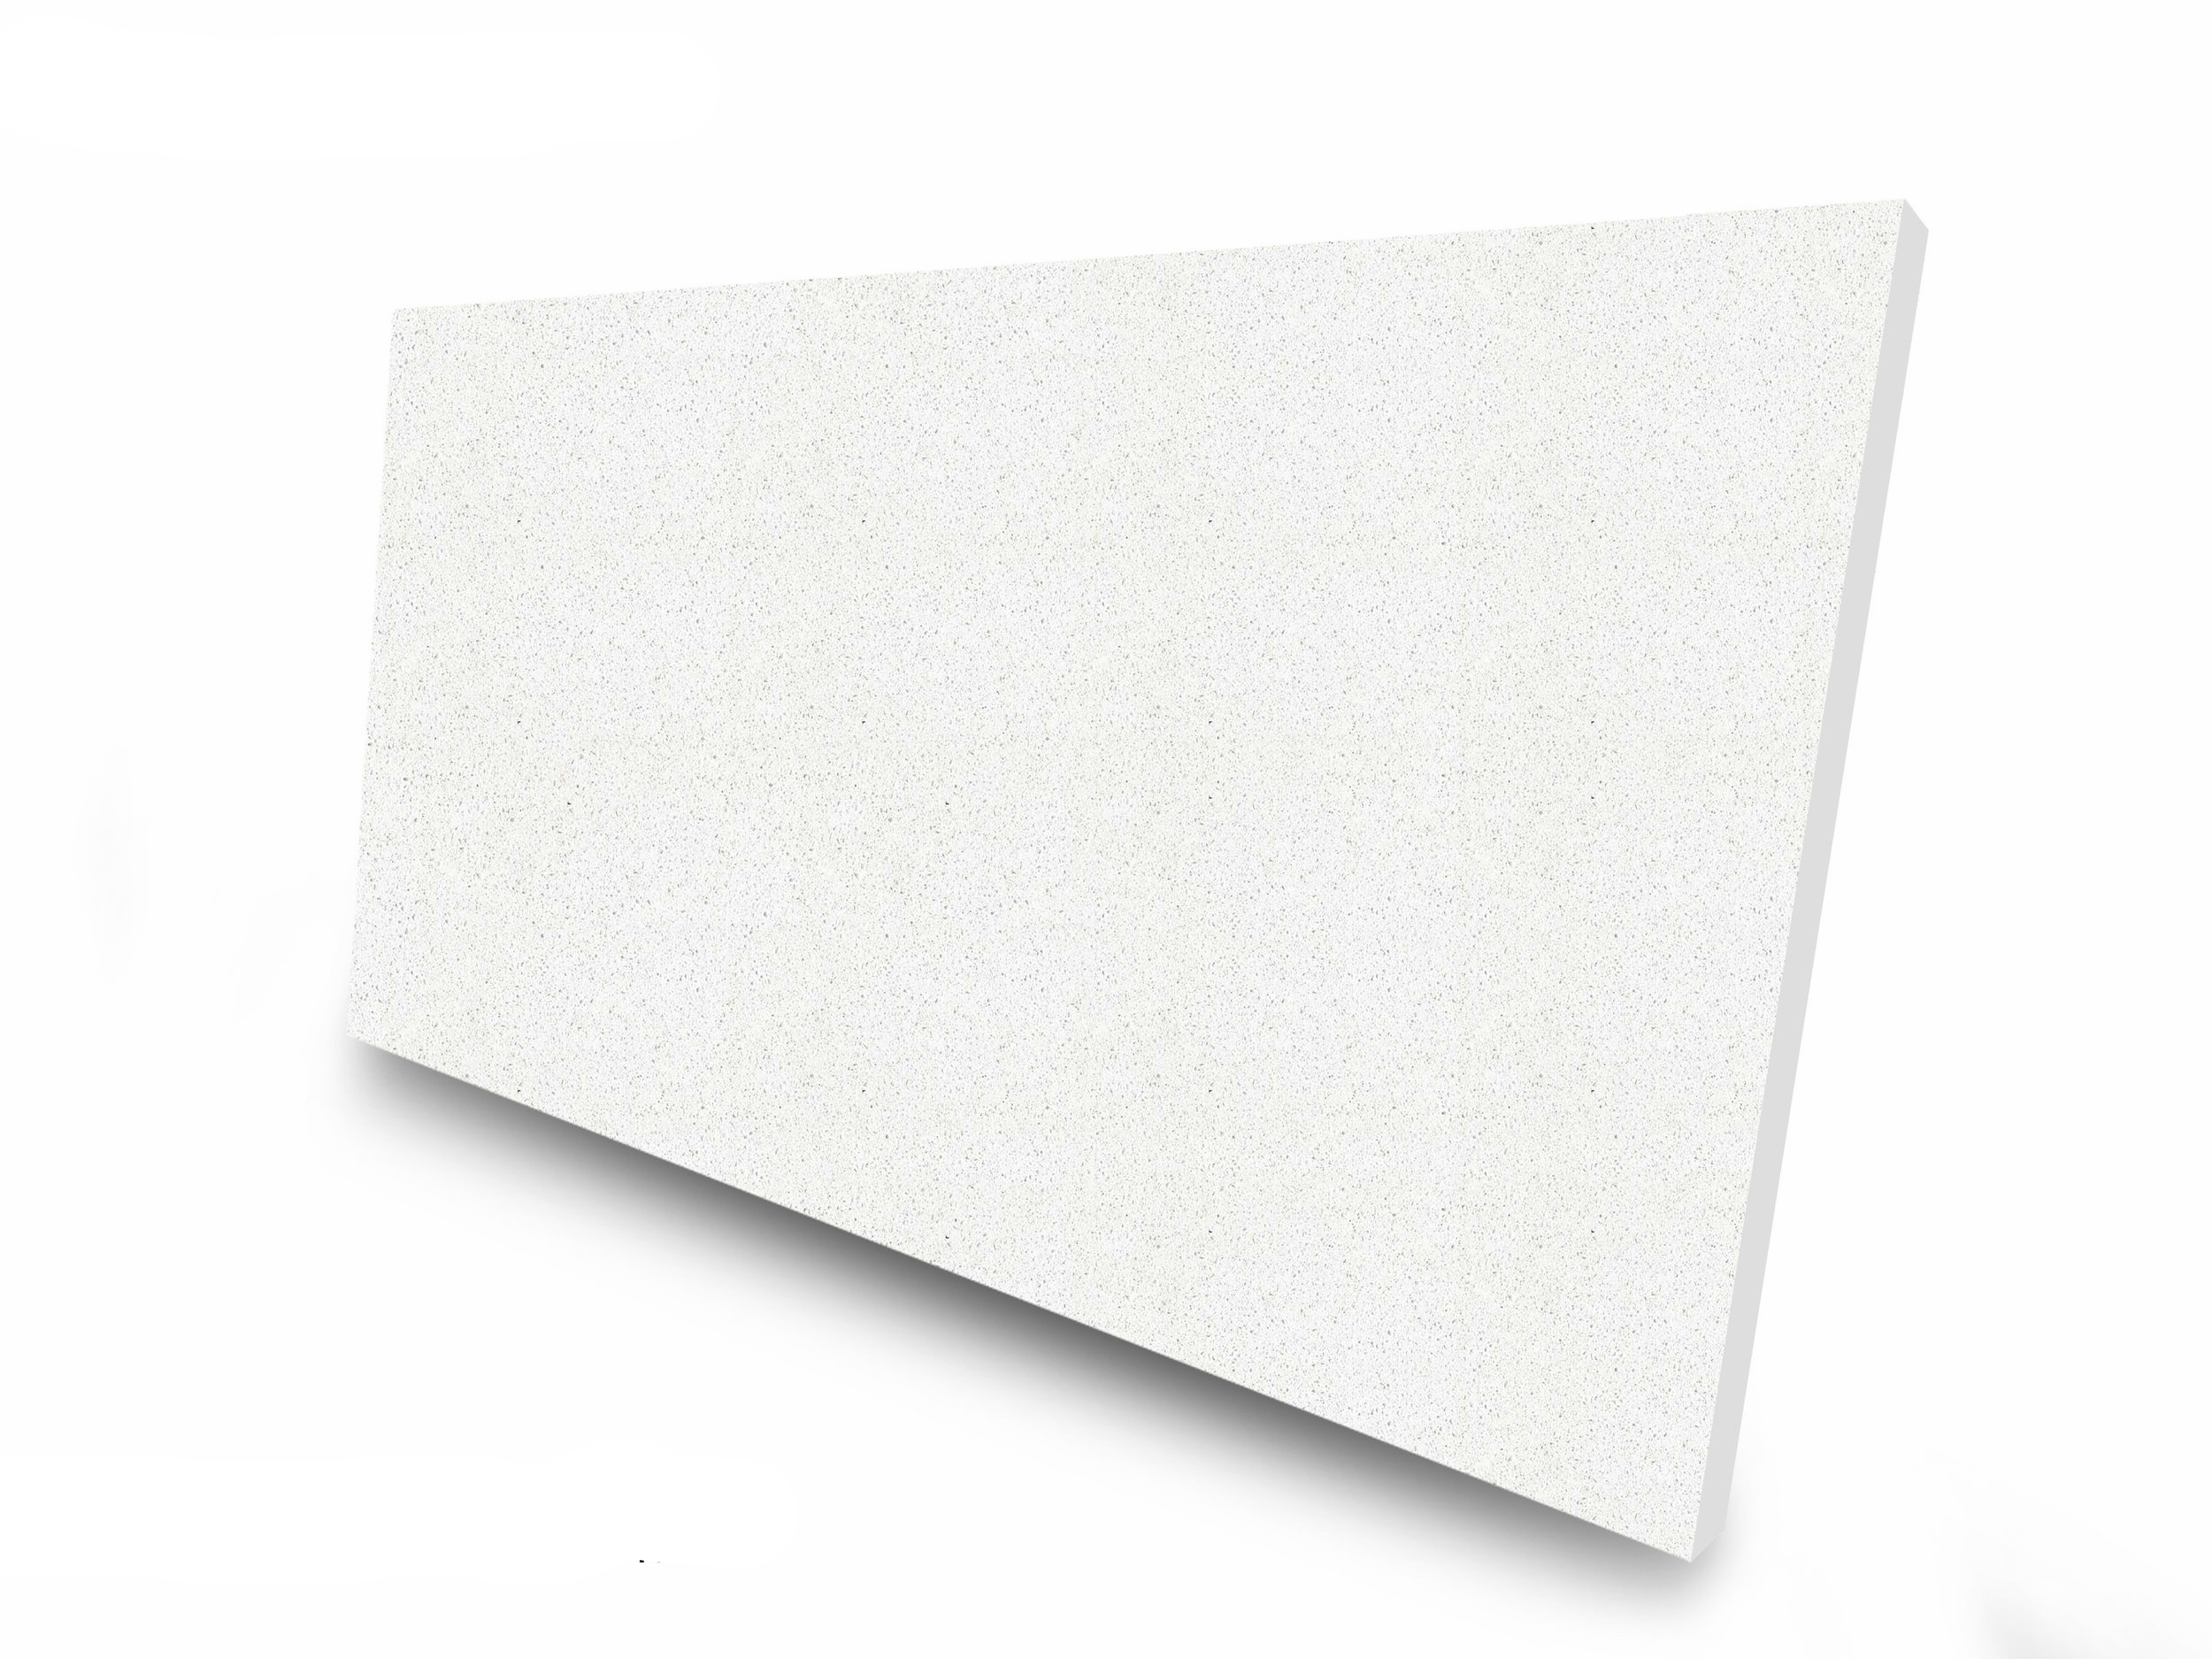 CQ712 Cotton White Slab